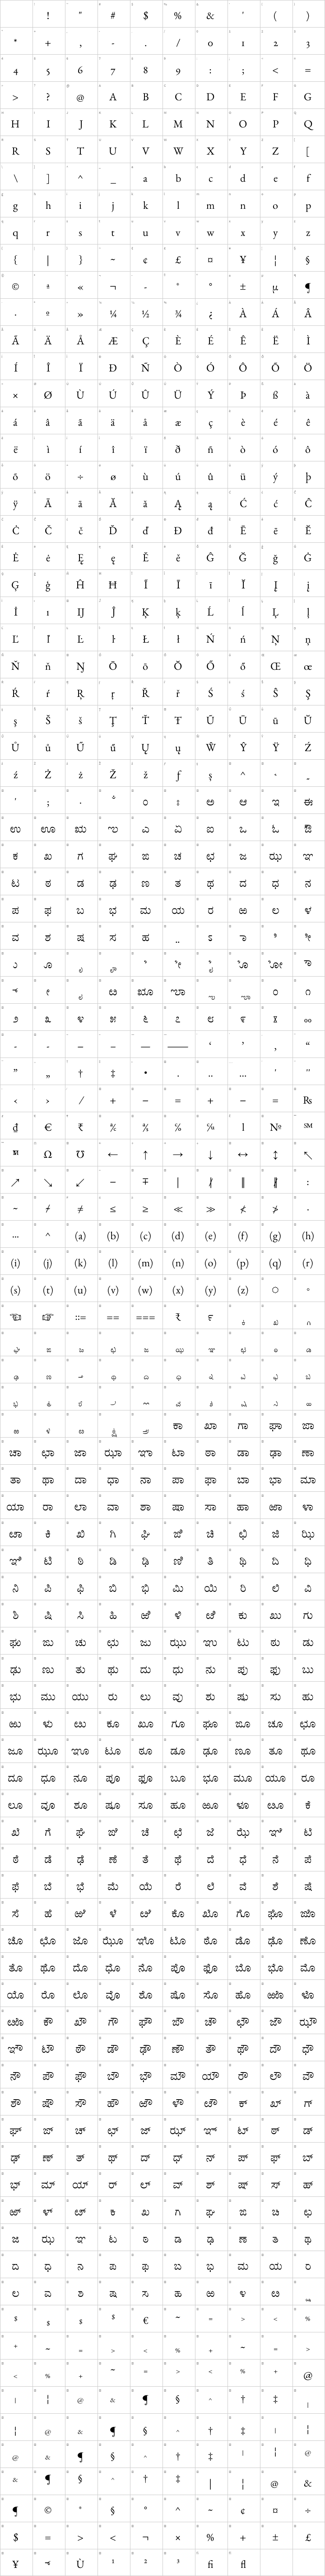 Benne Font Free by John Harrington